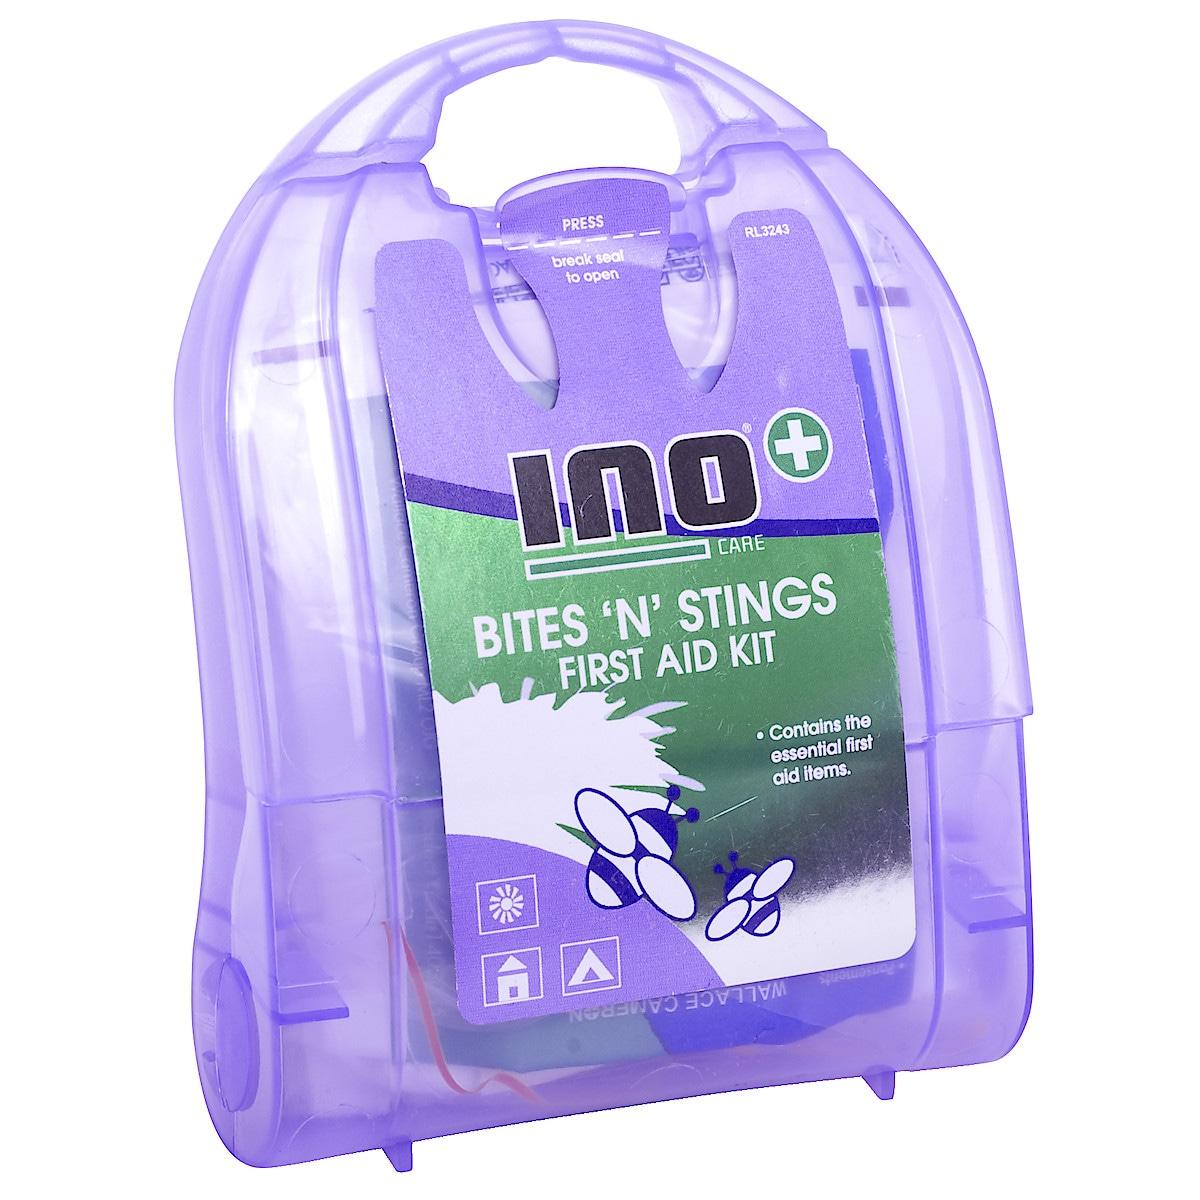 Första hjälpen-kit Bites 'n' Stings, Ino-Care